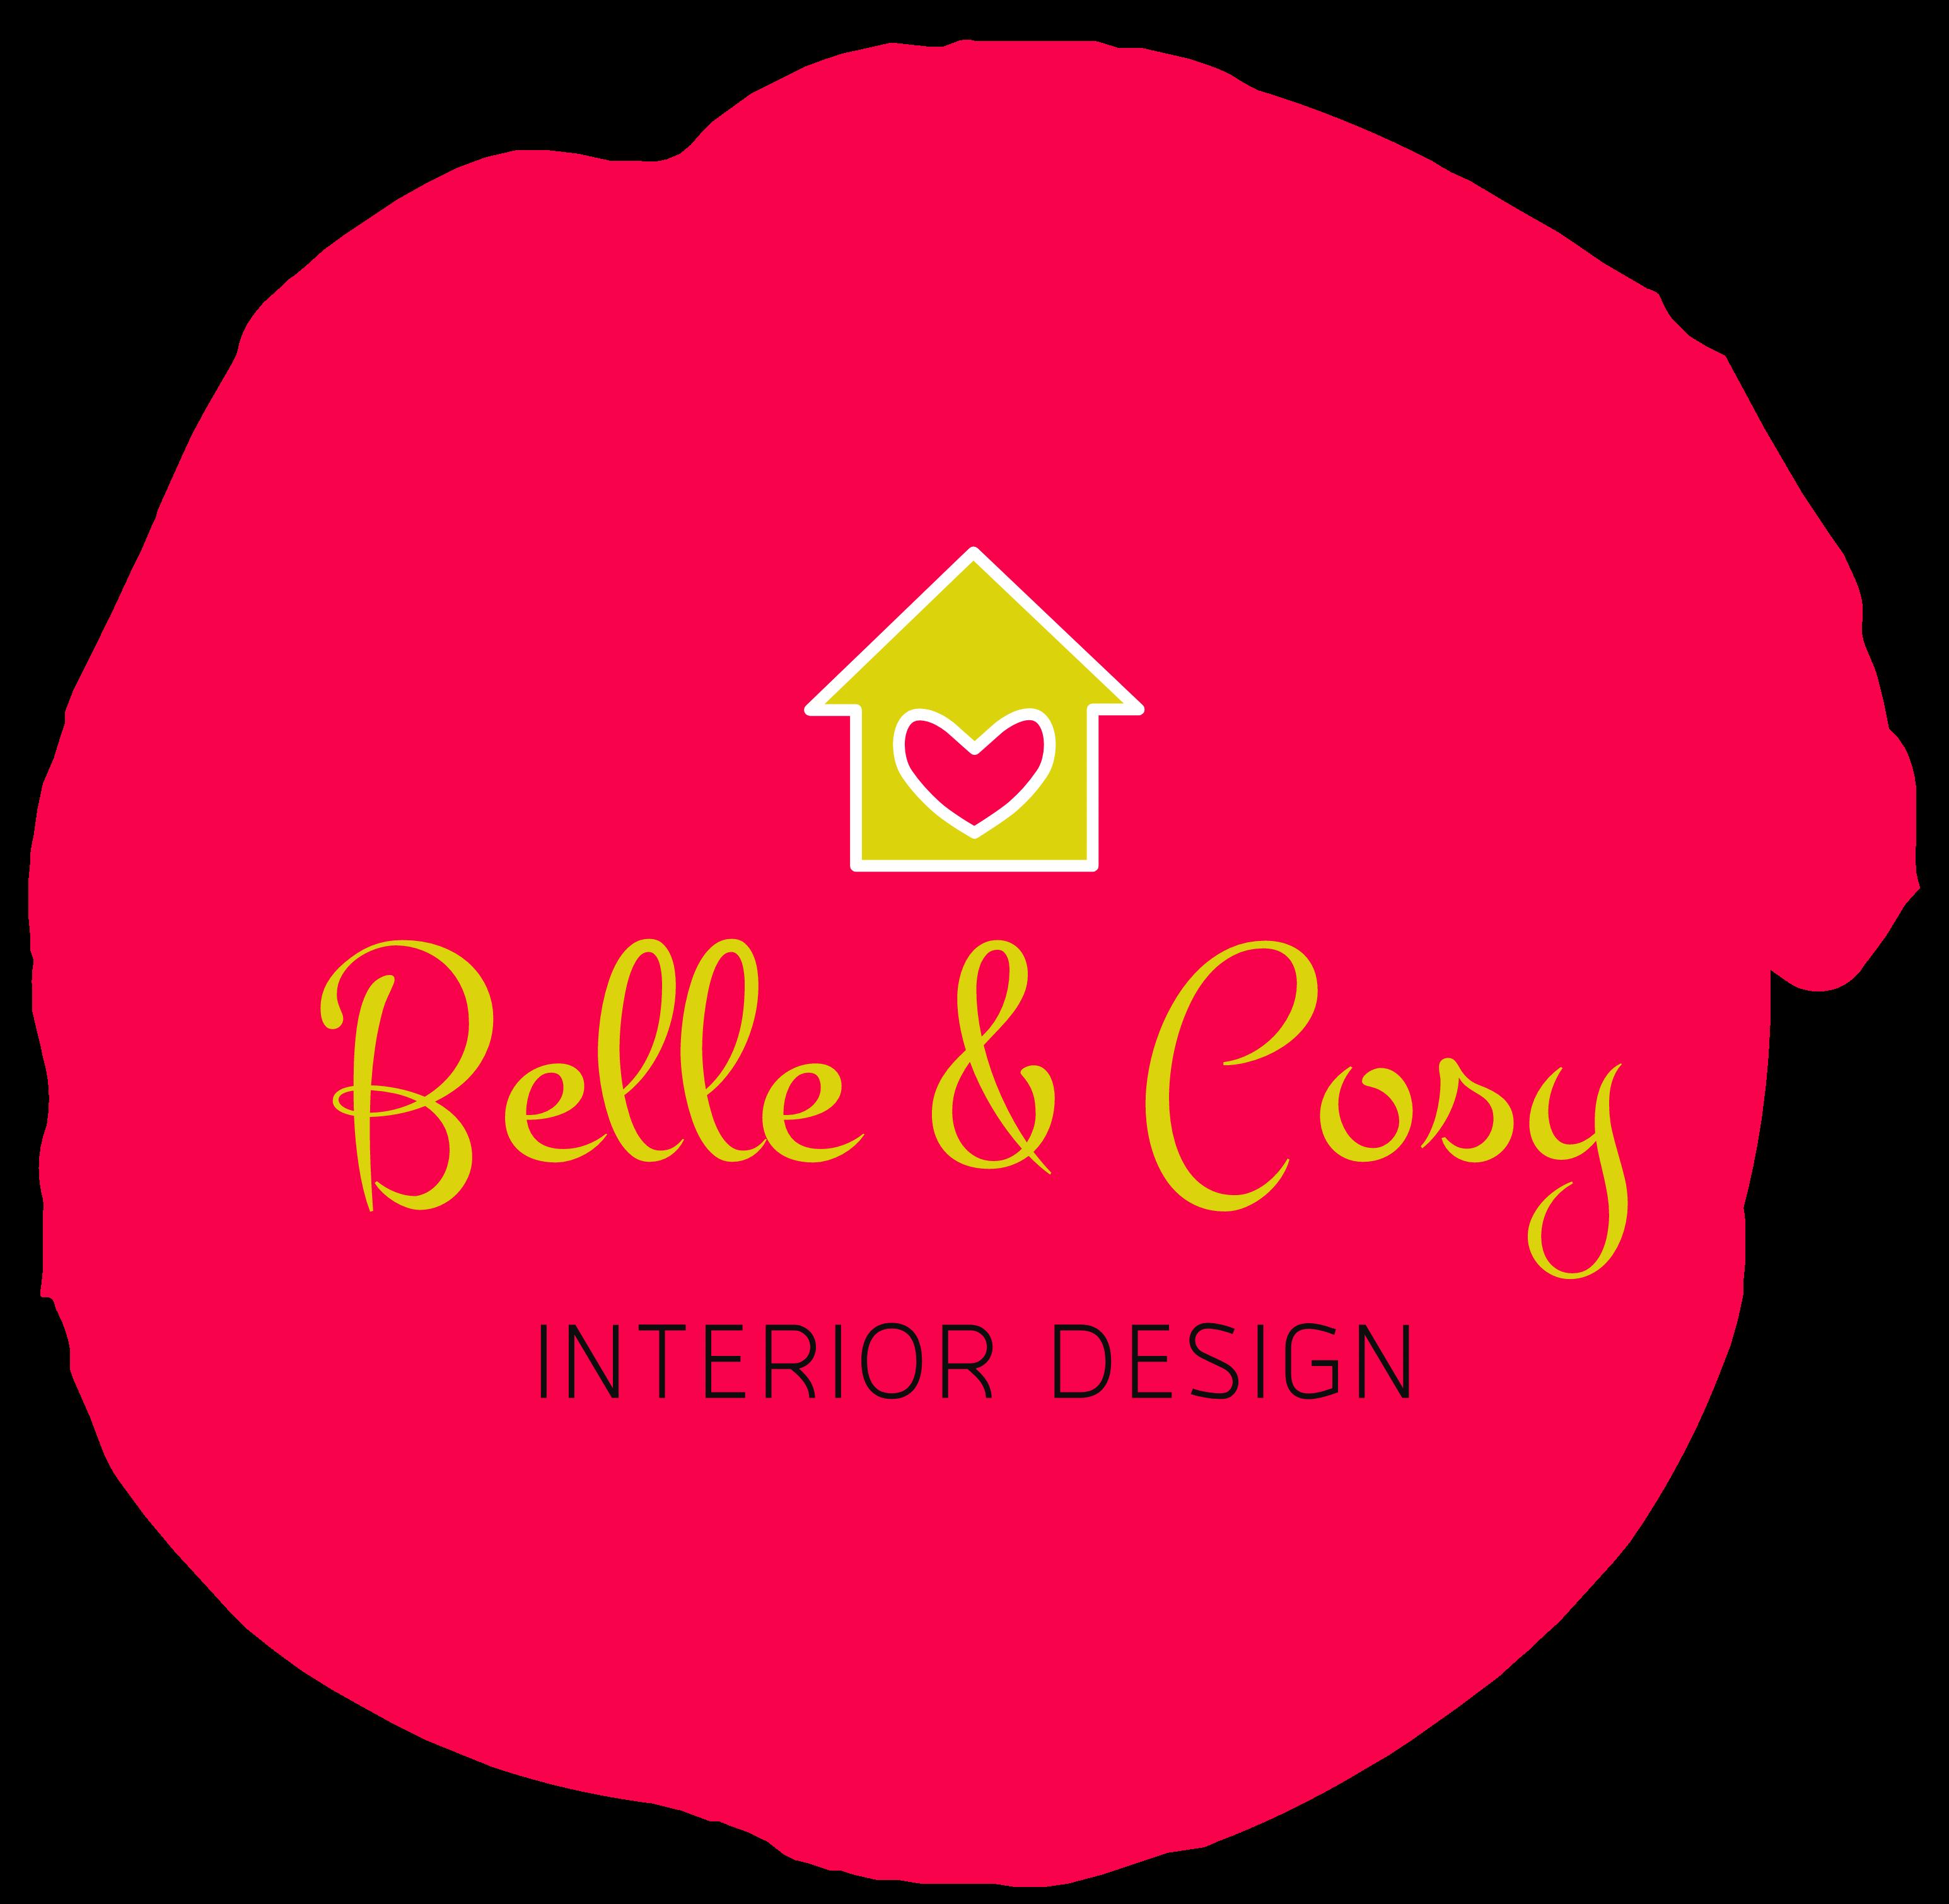 Belle & Cosy Interior Design